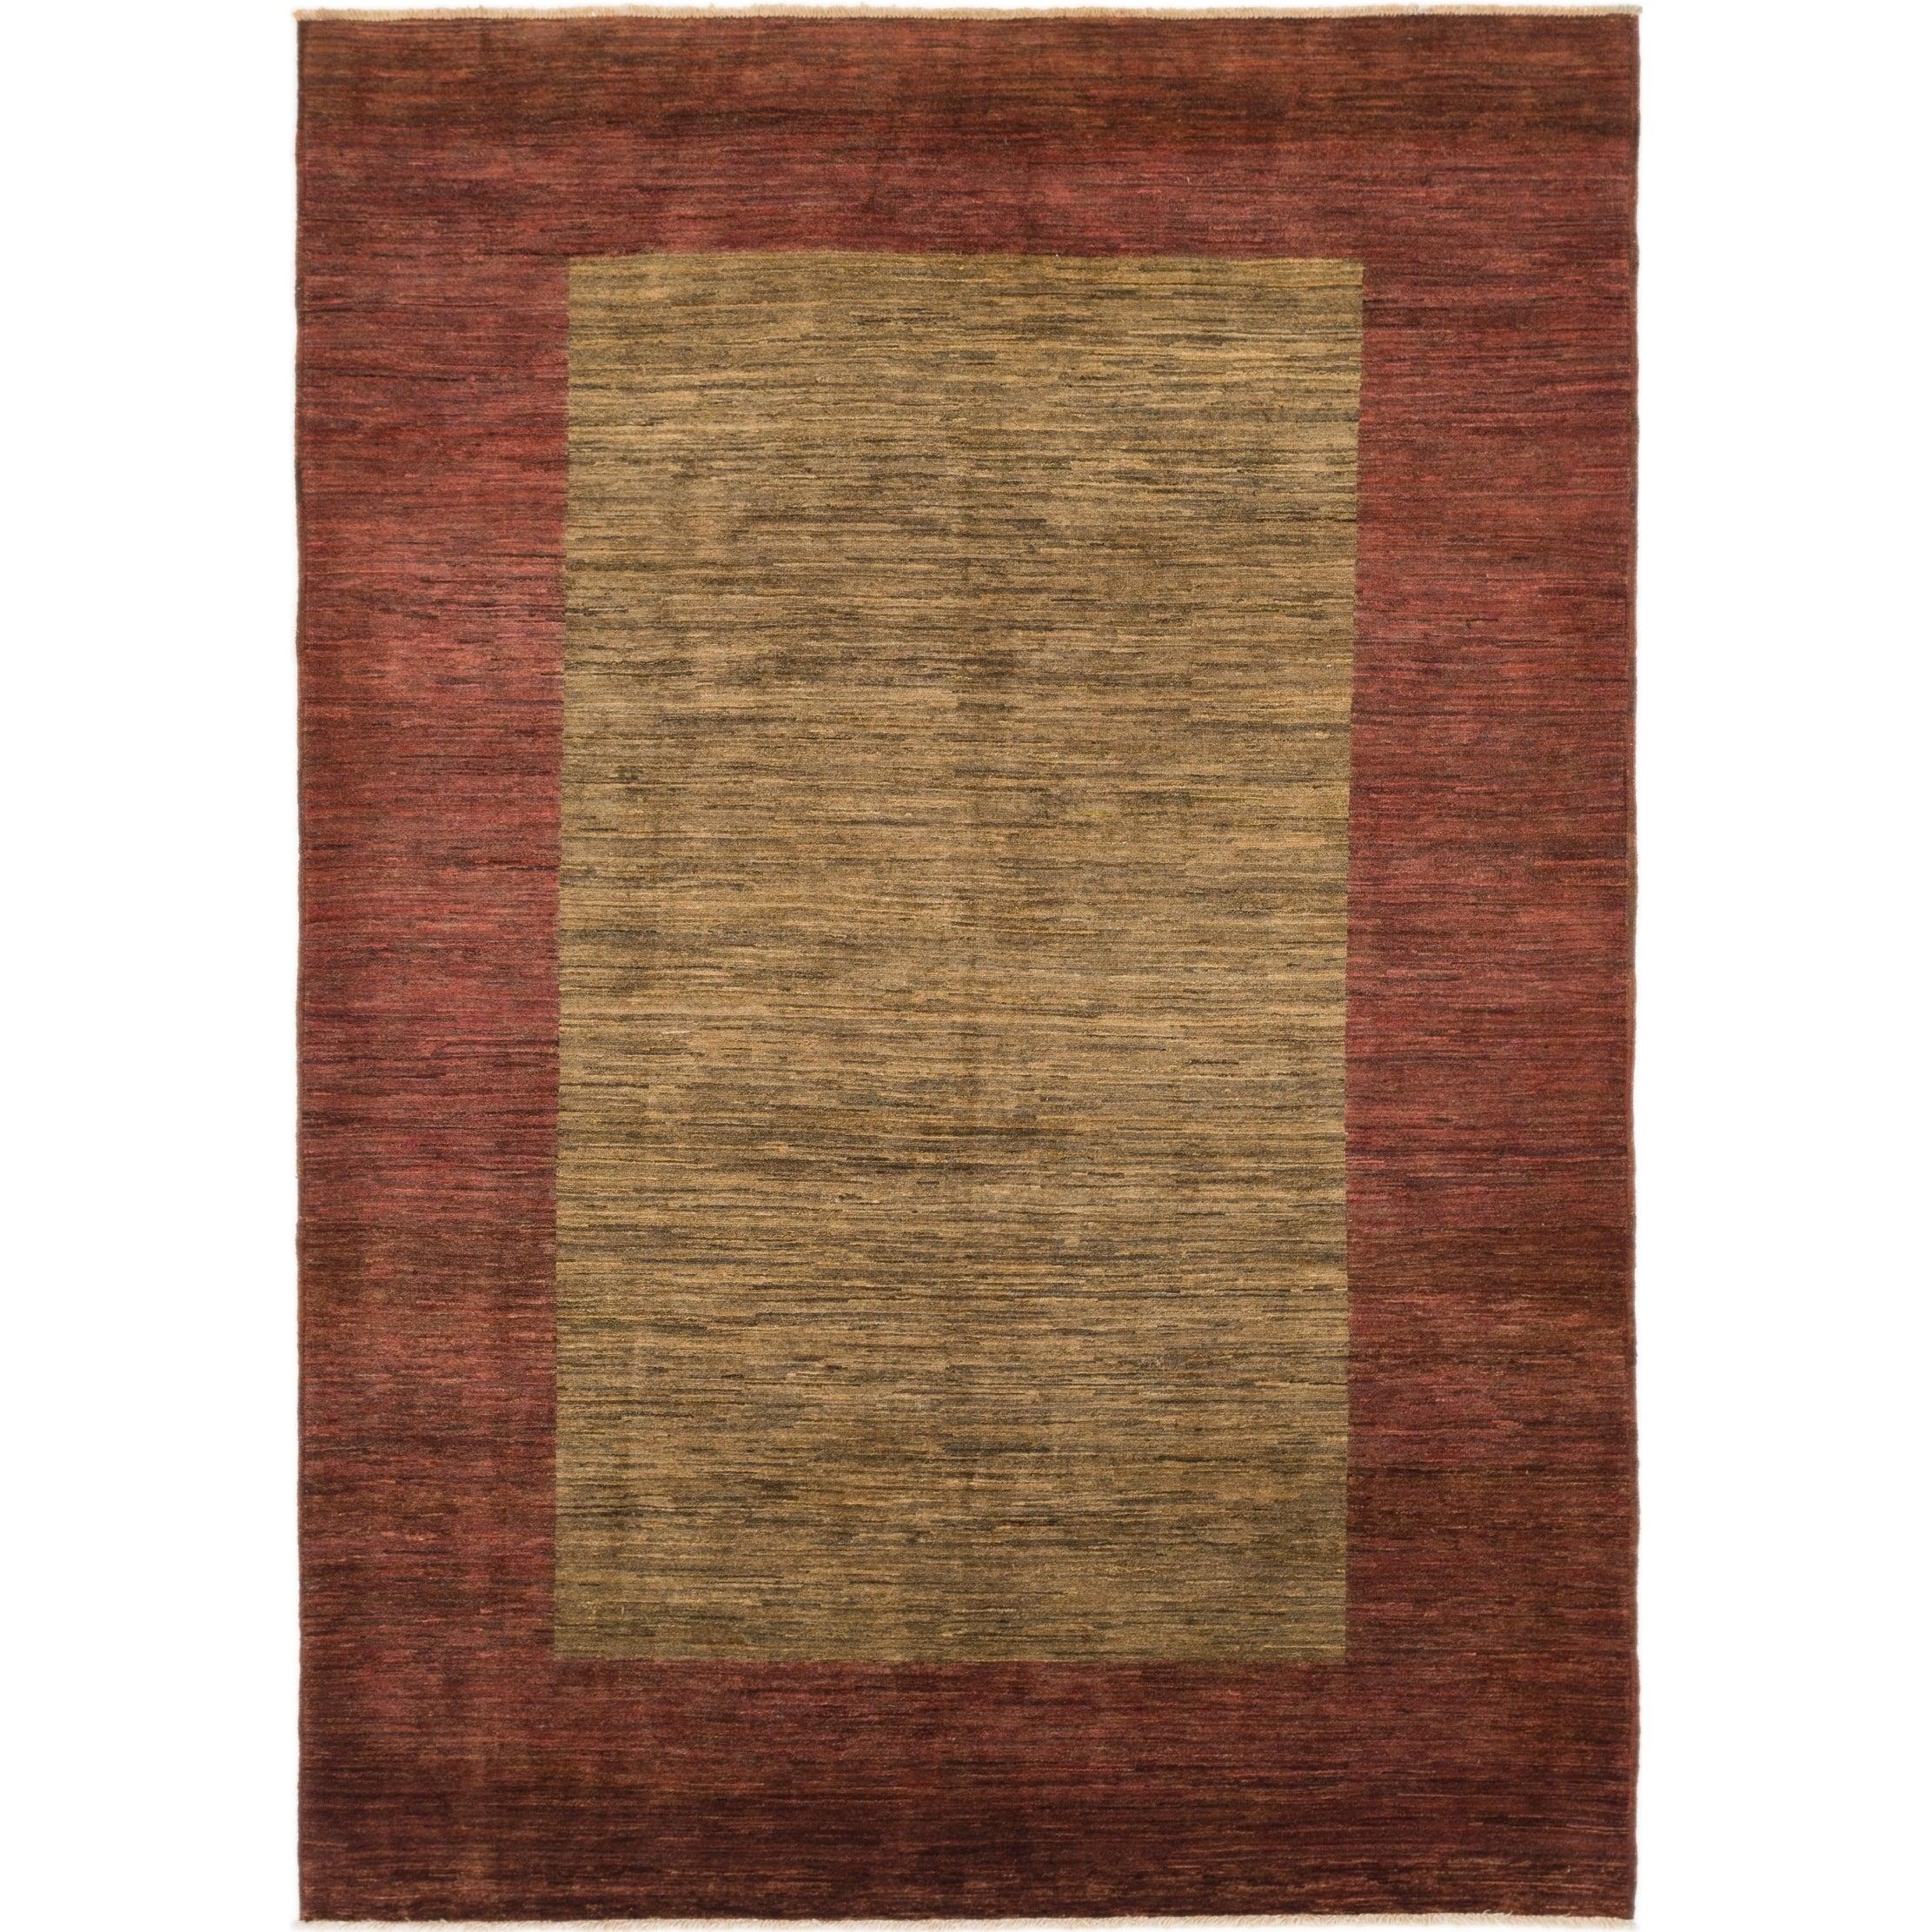 Hand Knotted Kashkuli Gabbeh Wool Runner Rug - 6 8 x 9 7 (Beige - 6 8 x 9 7)